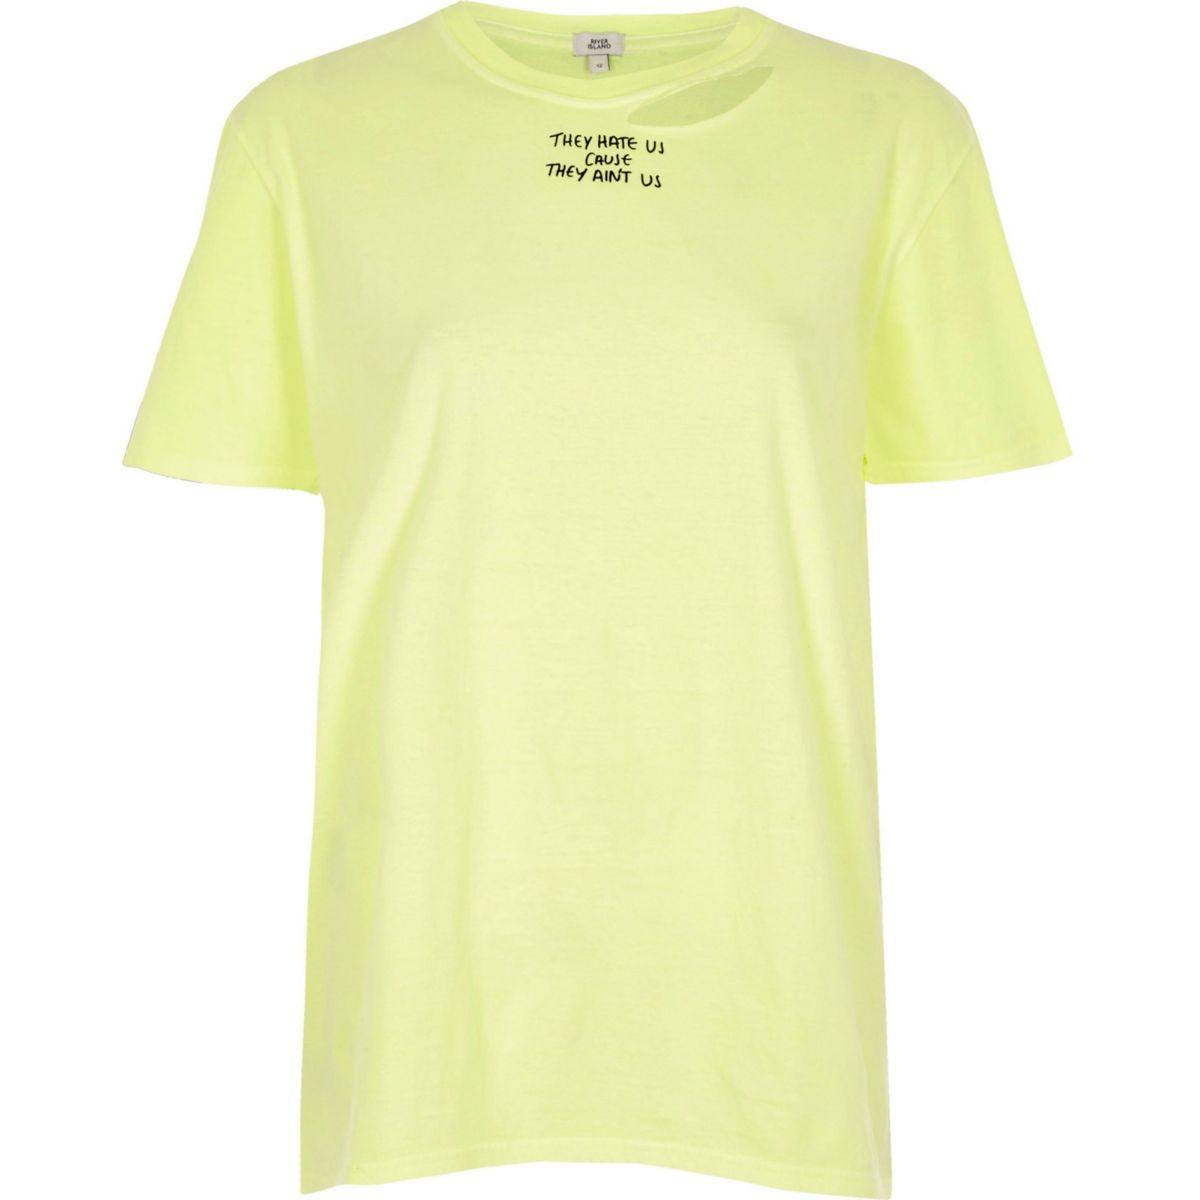 Yellow slogan print distressed T-shirt